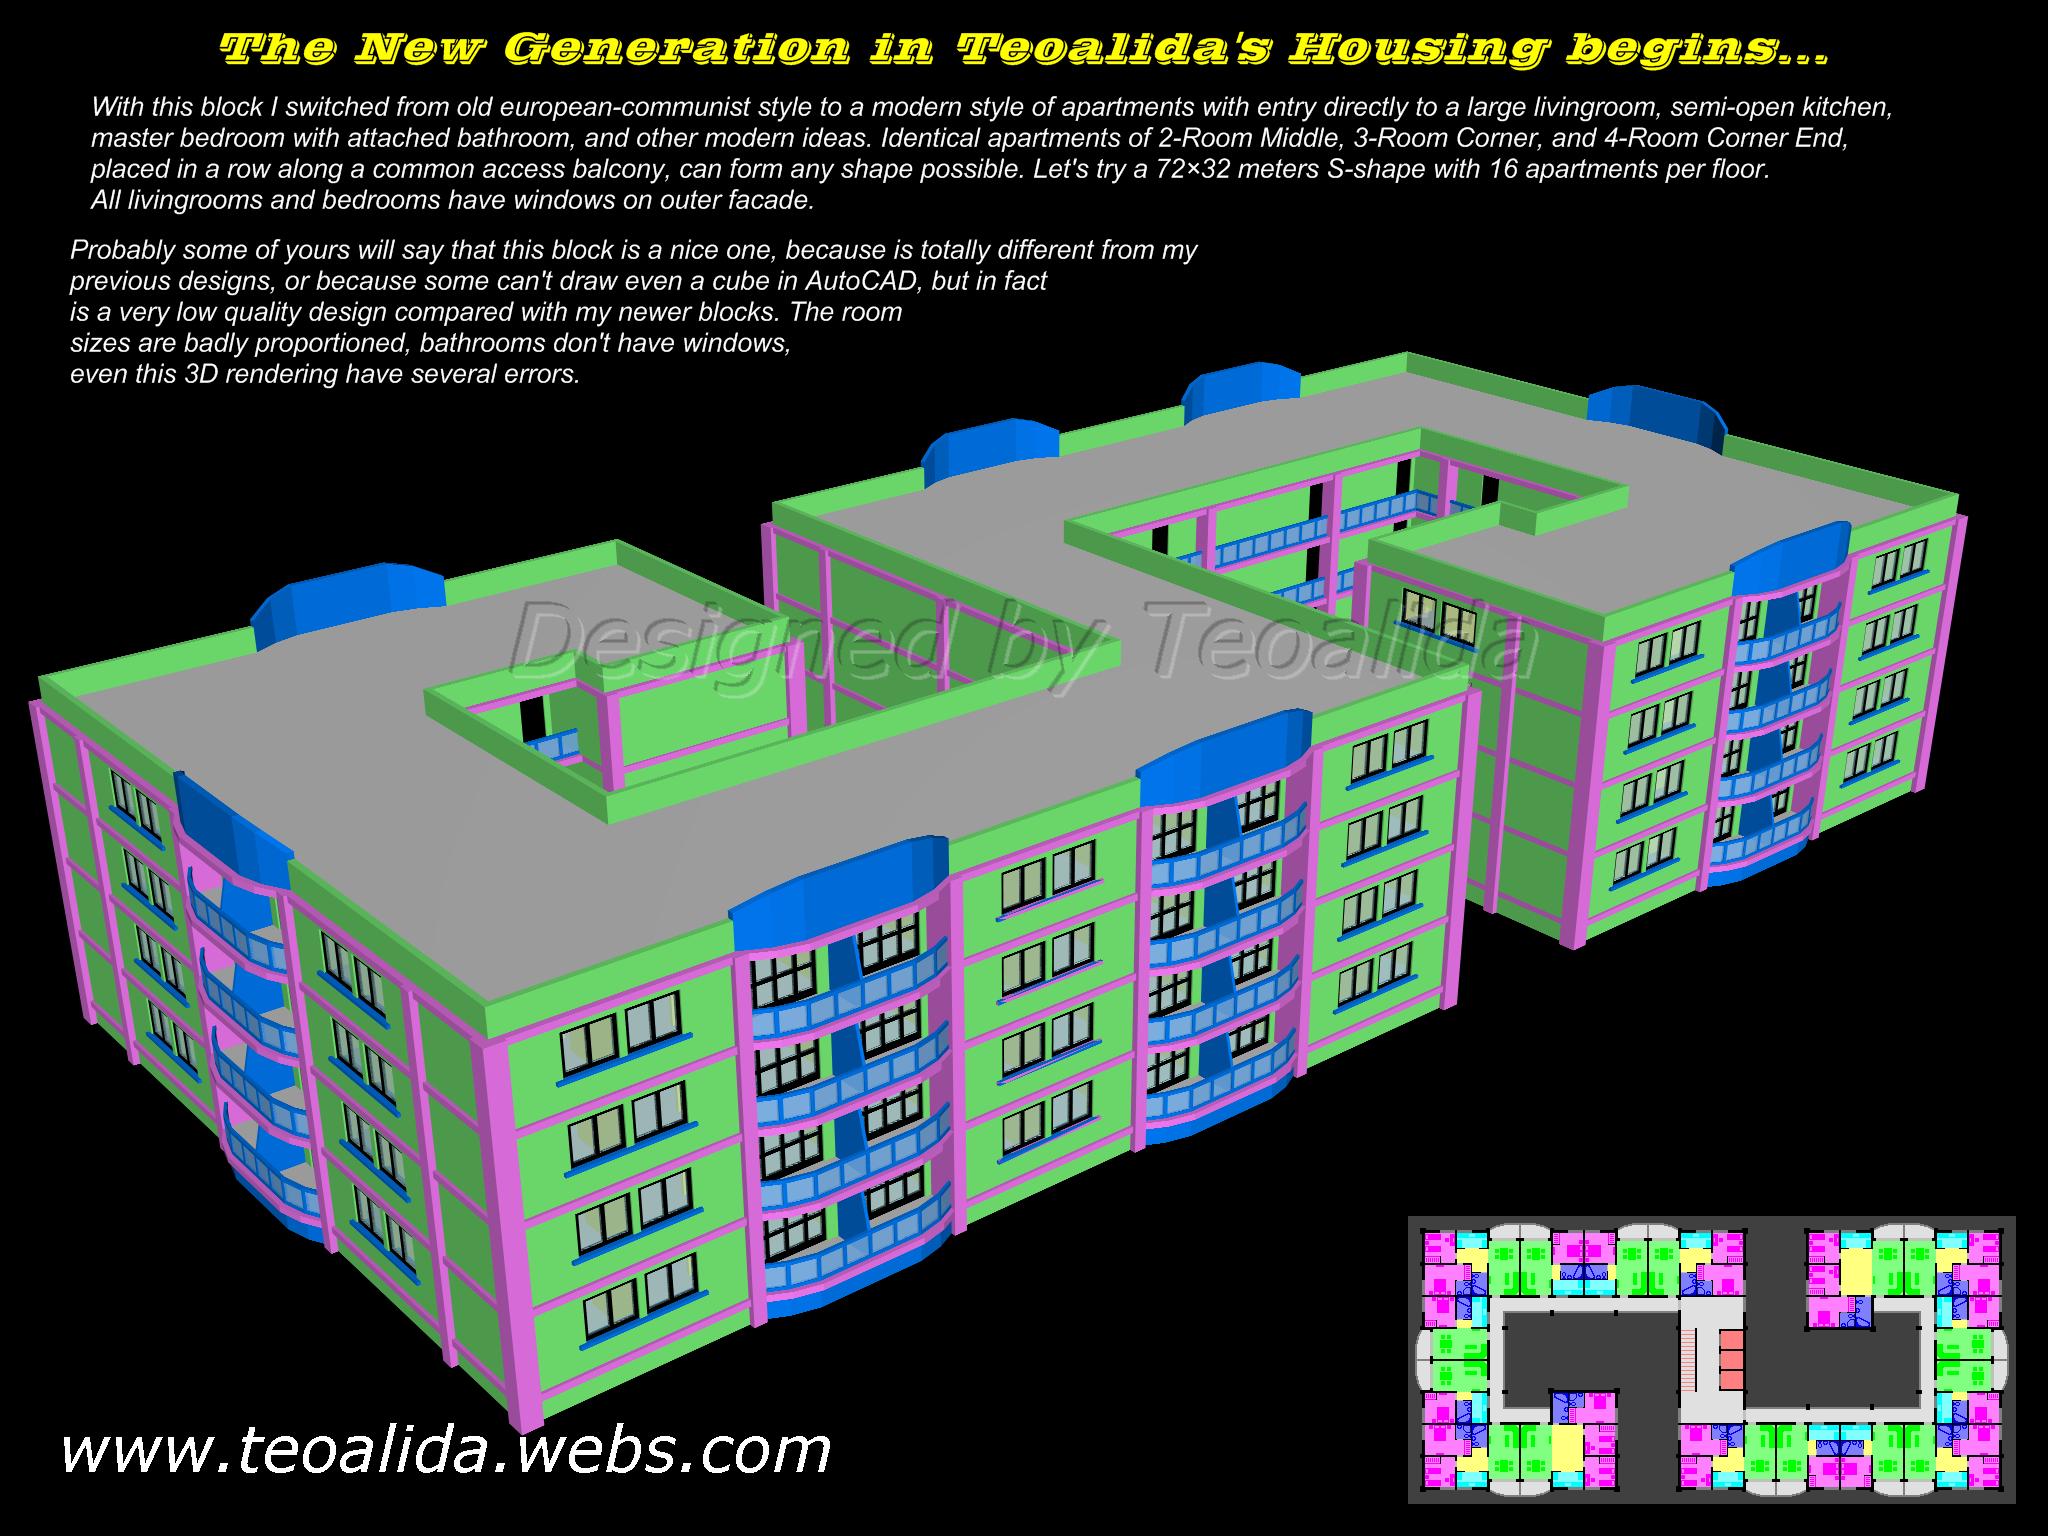 Architecture Amp Housing Design 2008 2015 Teoalida Website